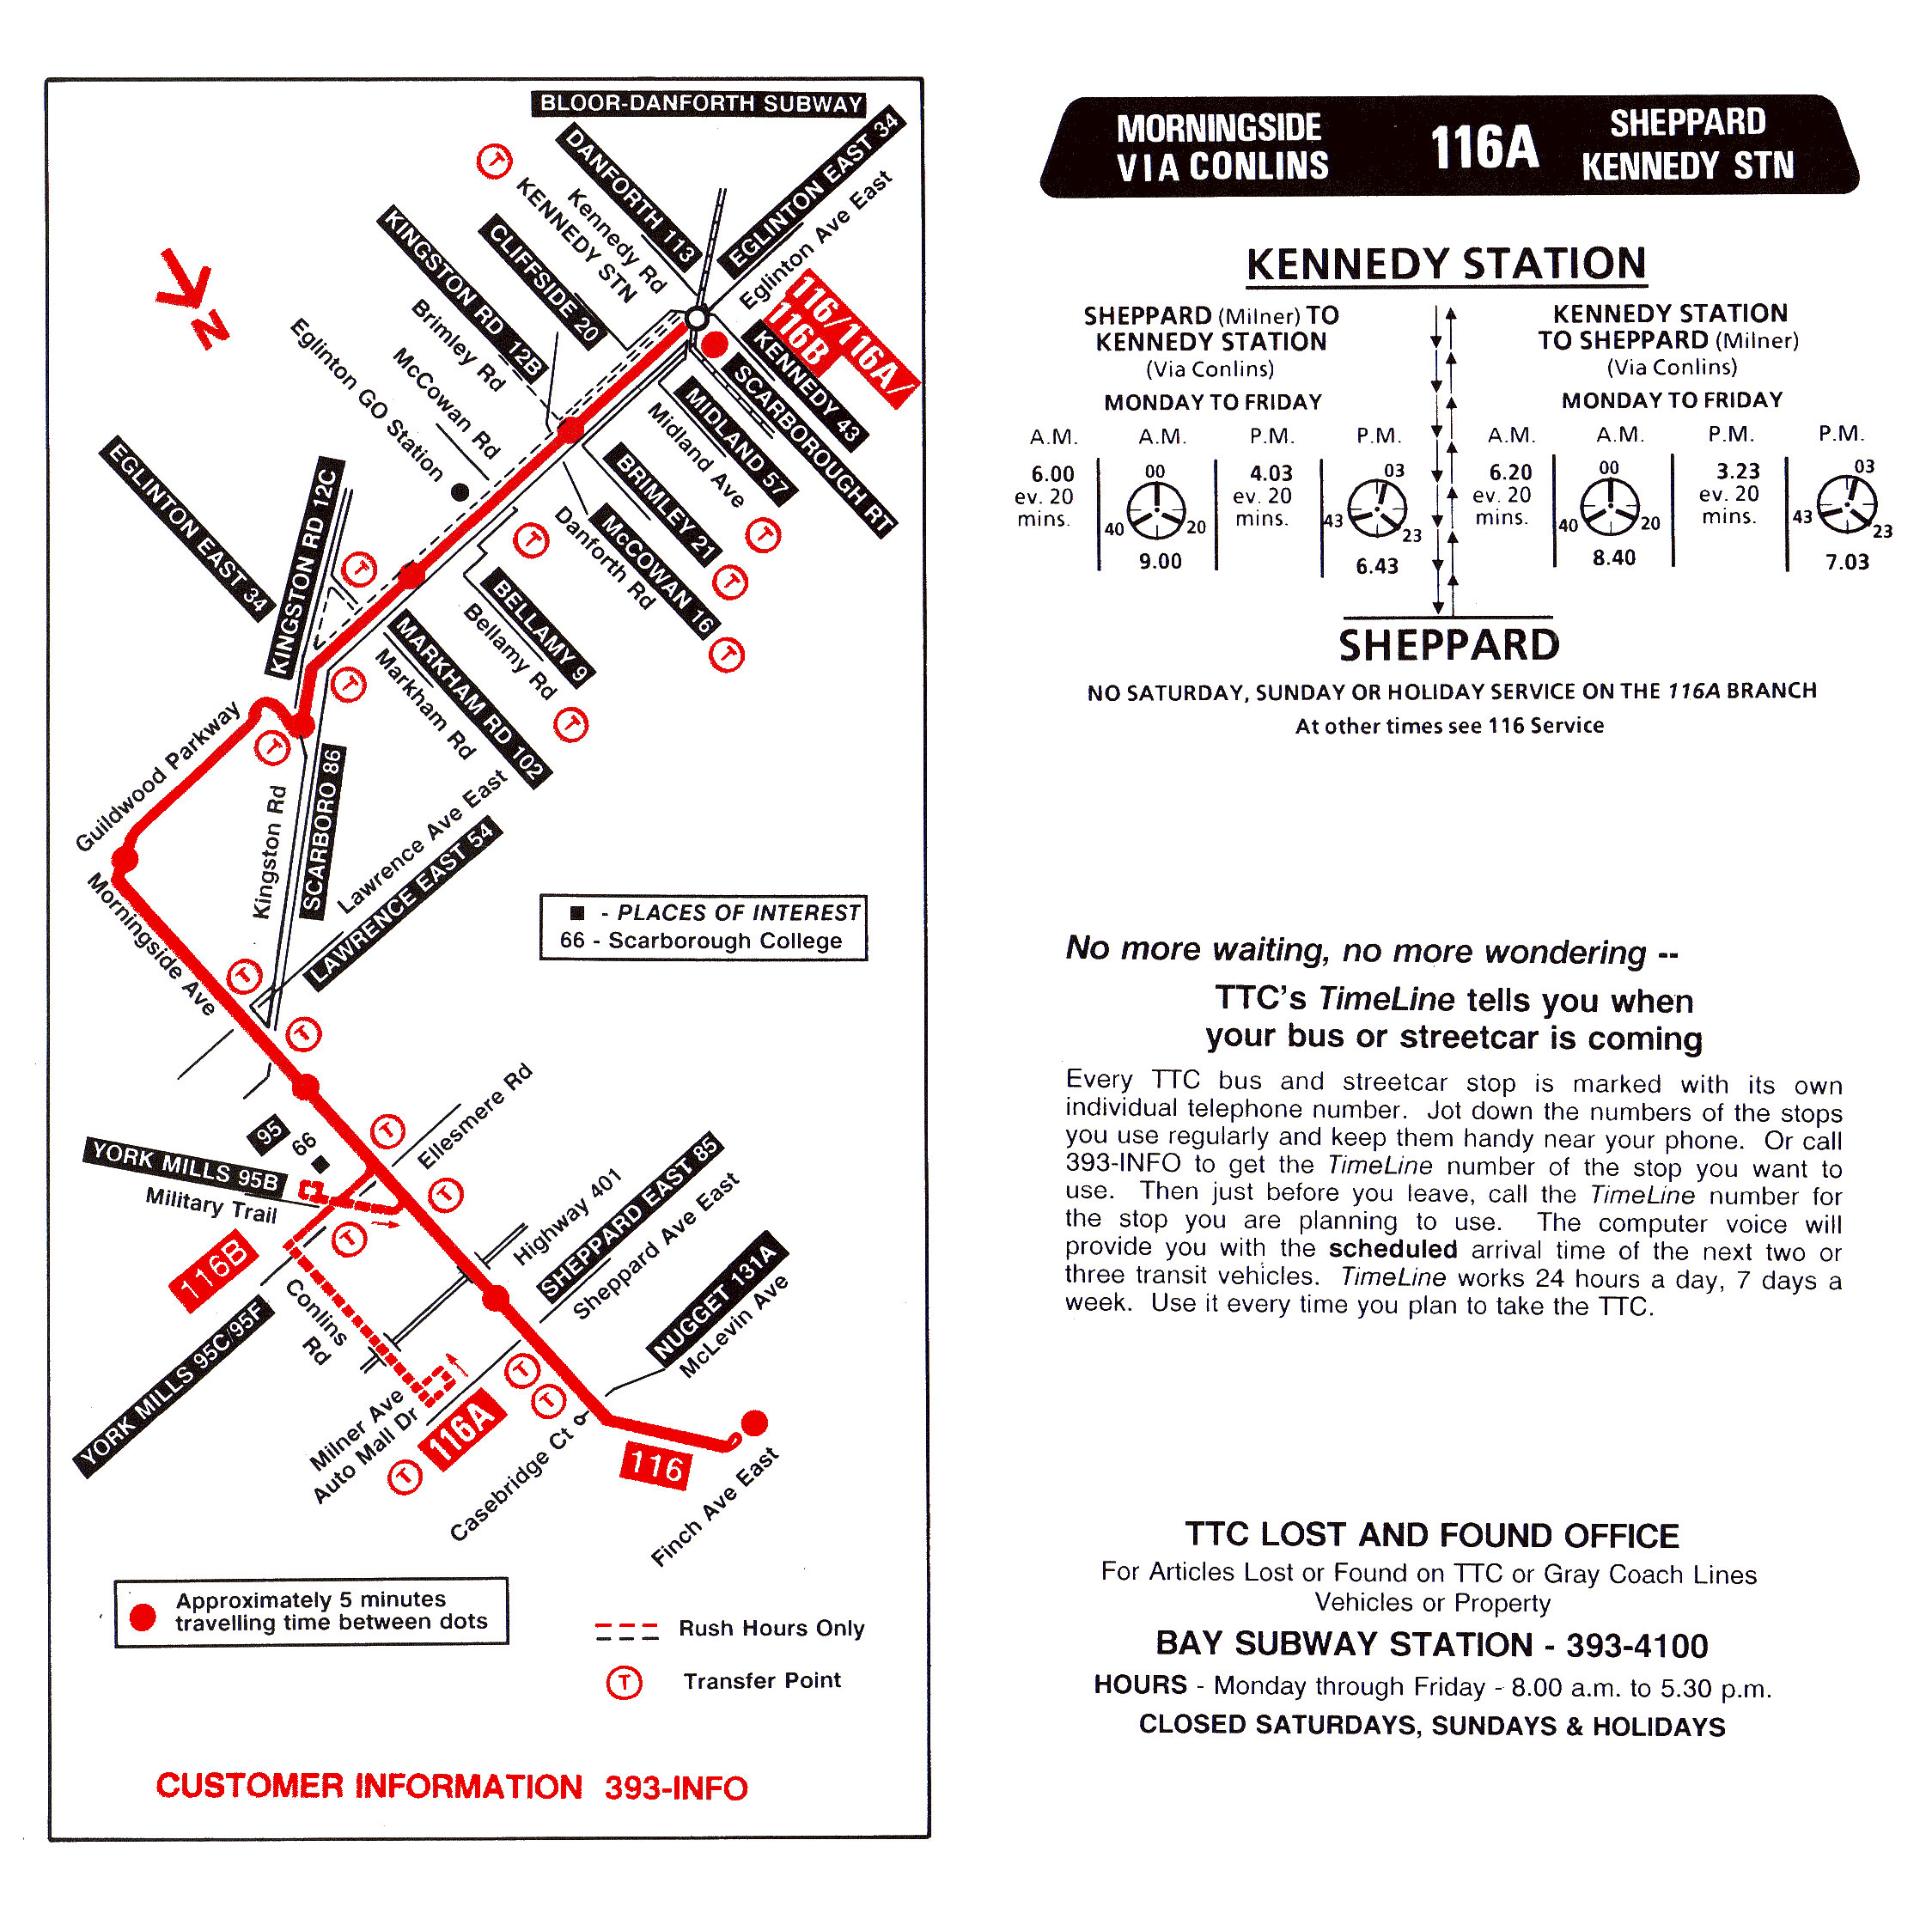 116 morningside - transit toronto - surface route histories